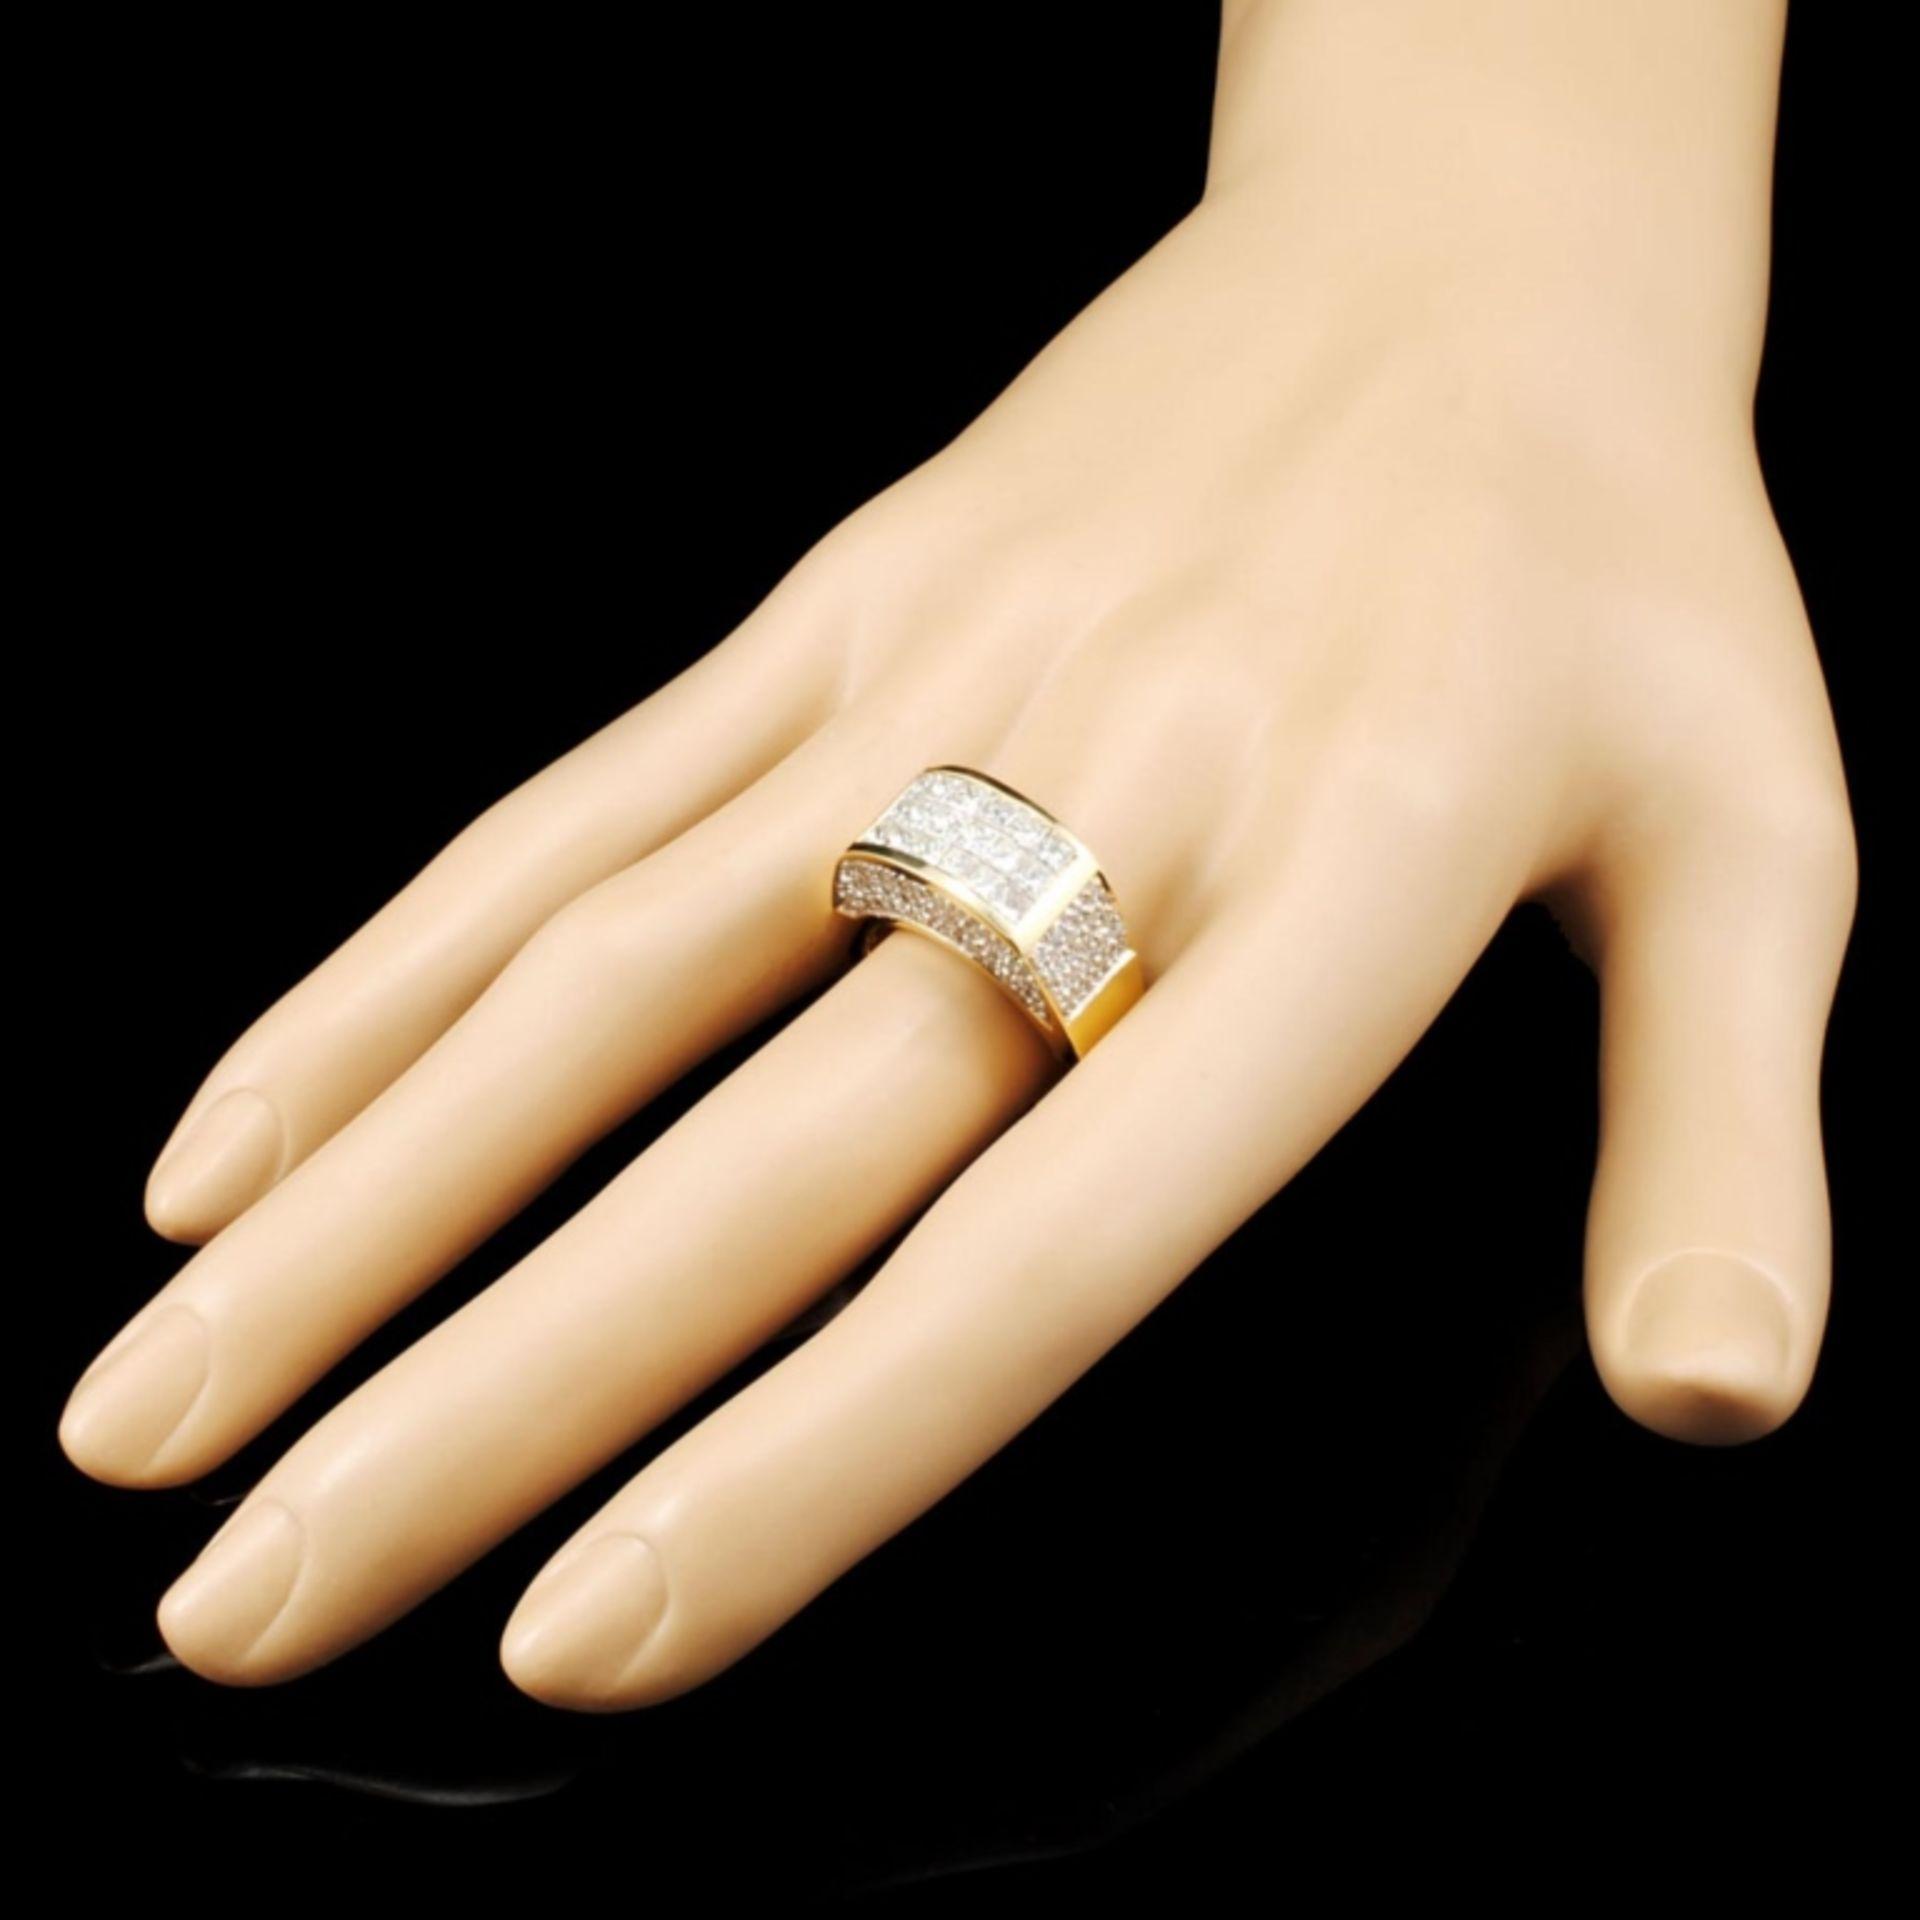 18K Gold 2.79ctw Diamond Ring - Image 3 of 5